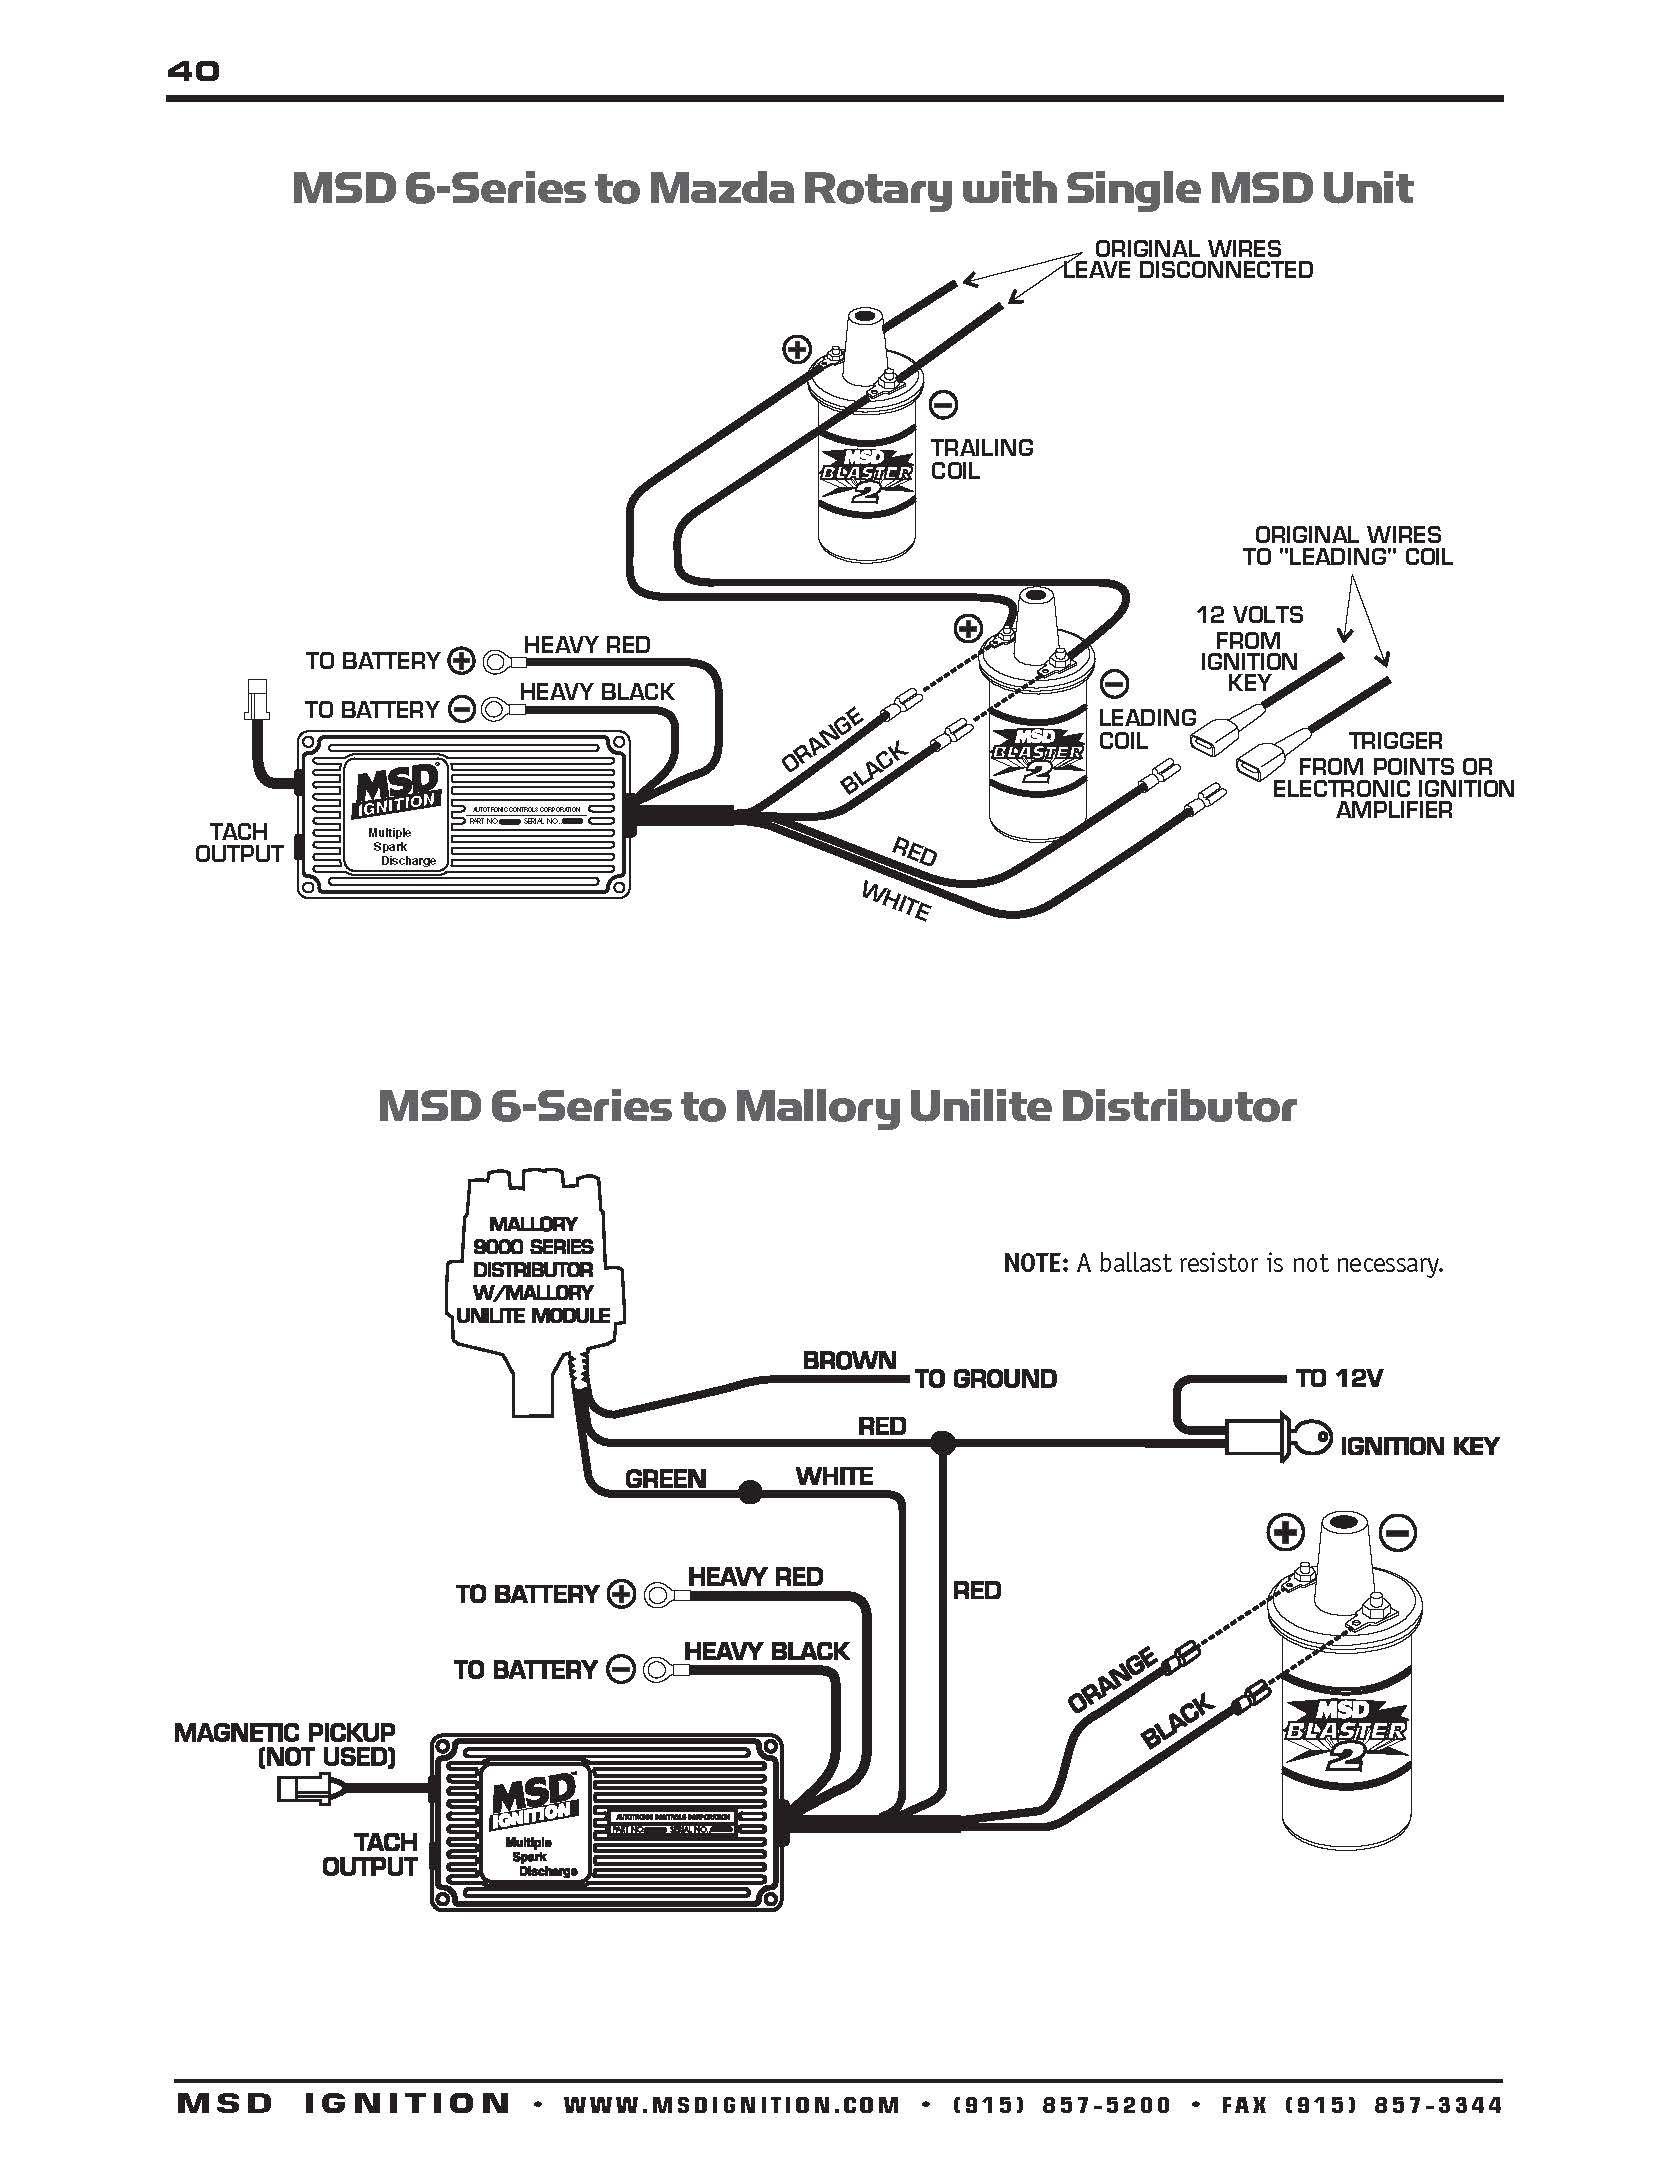 Mallory Unilite Distributor Wiring Diagram : mallory, unilite, distributor, wiring, diagram, Mallory, Unilite, Wiring, Diagram, Diagrams, Schematics, Inside, Distributor, Wire,, Electronic, Distributors,